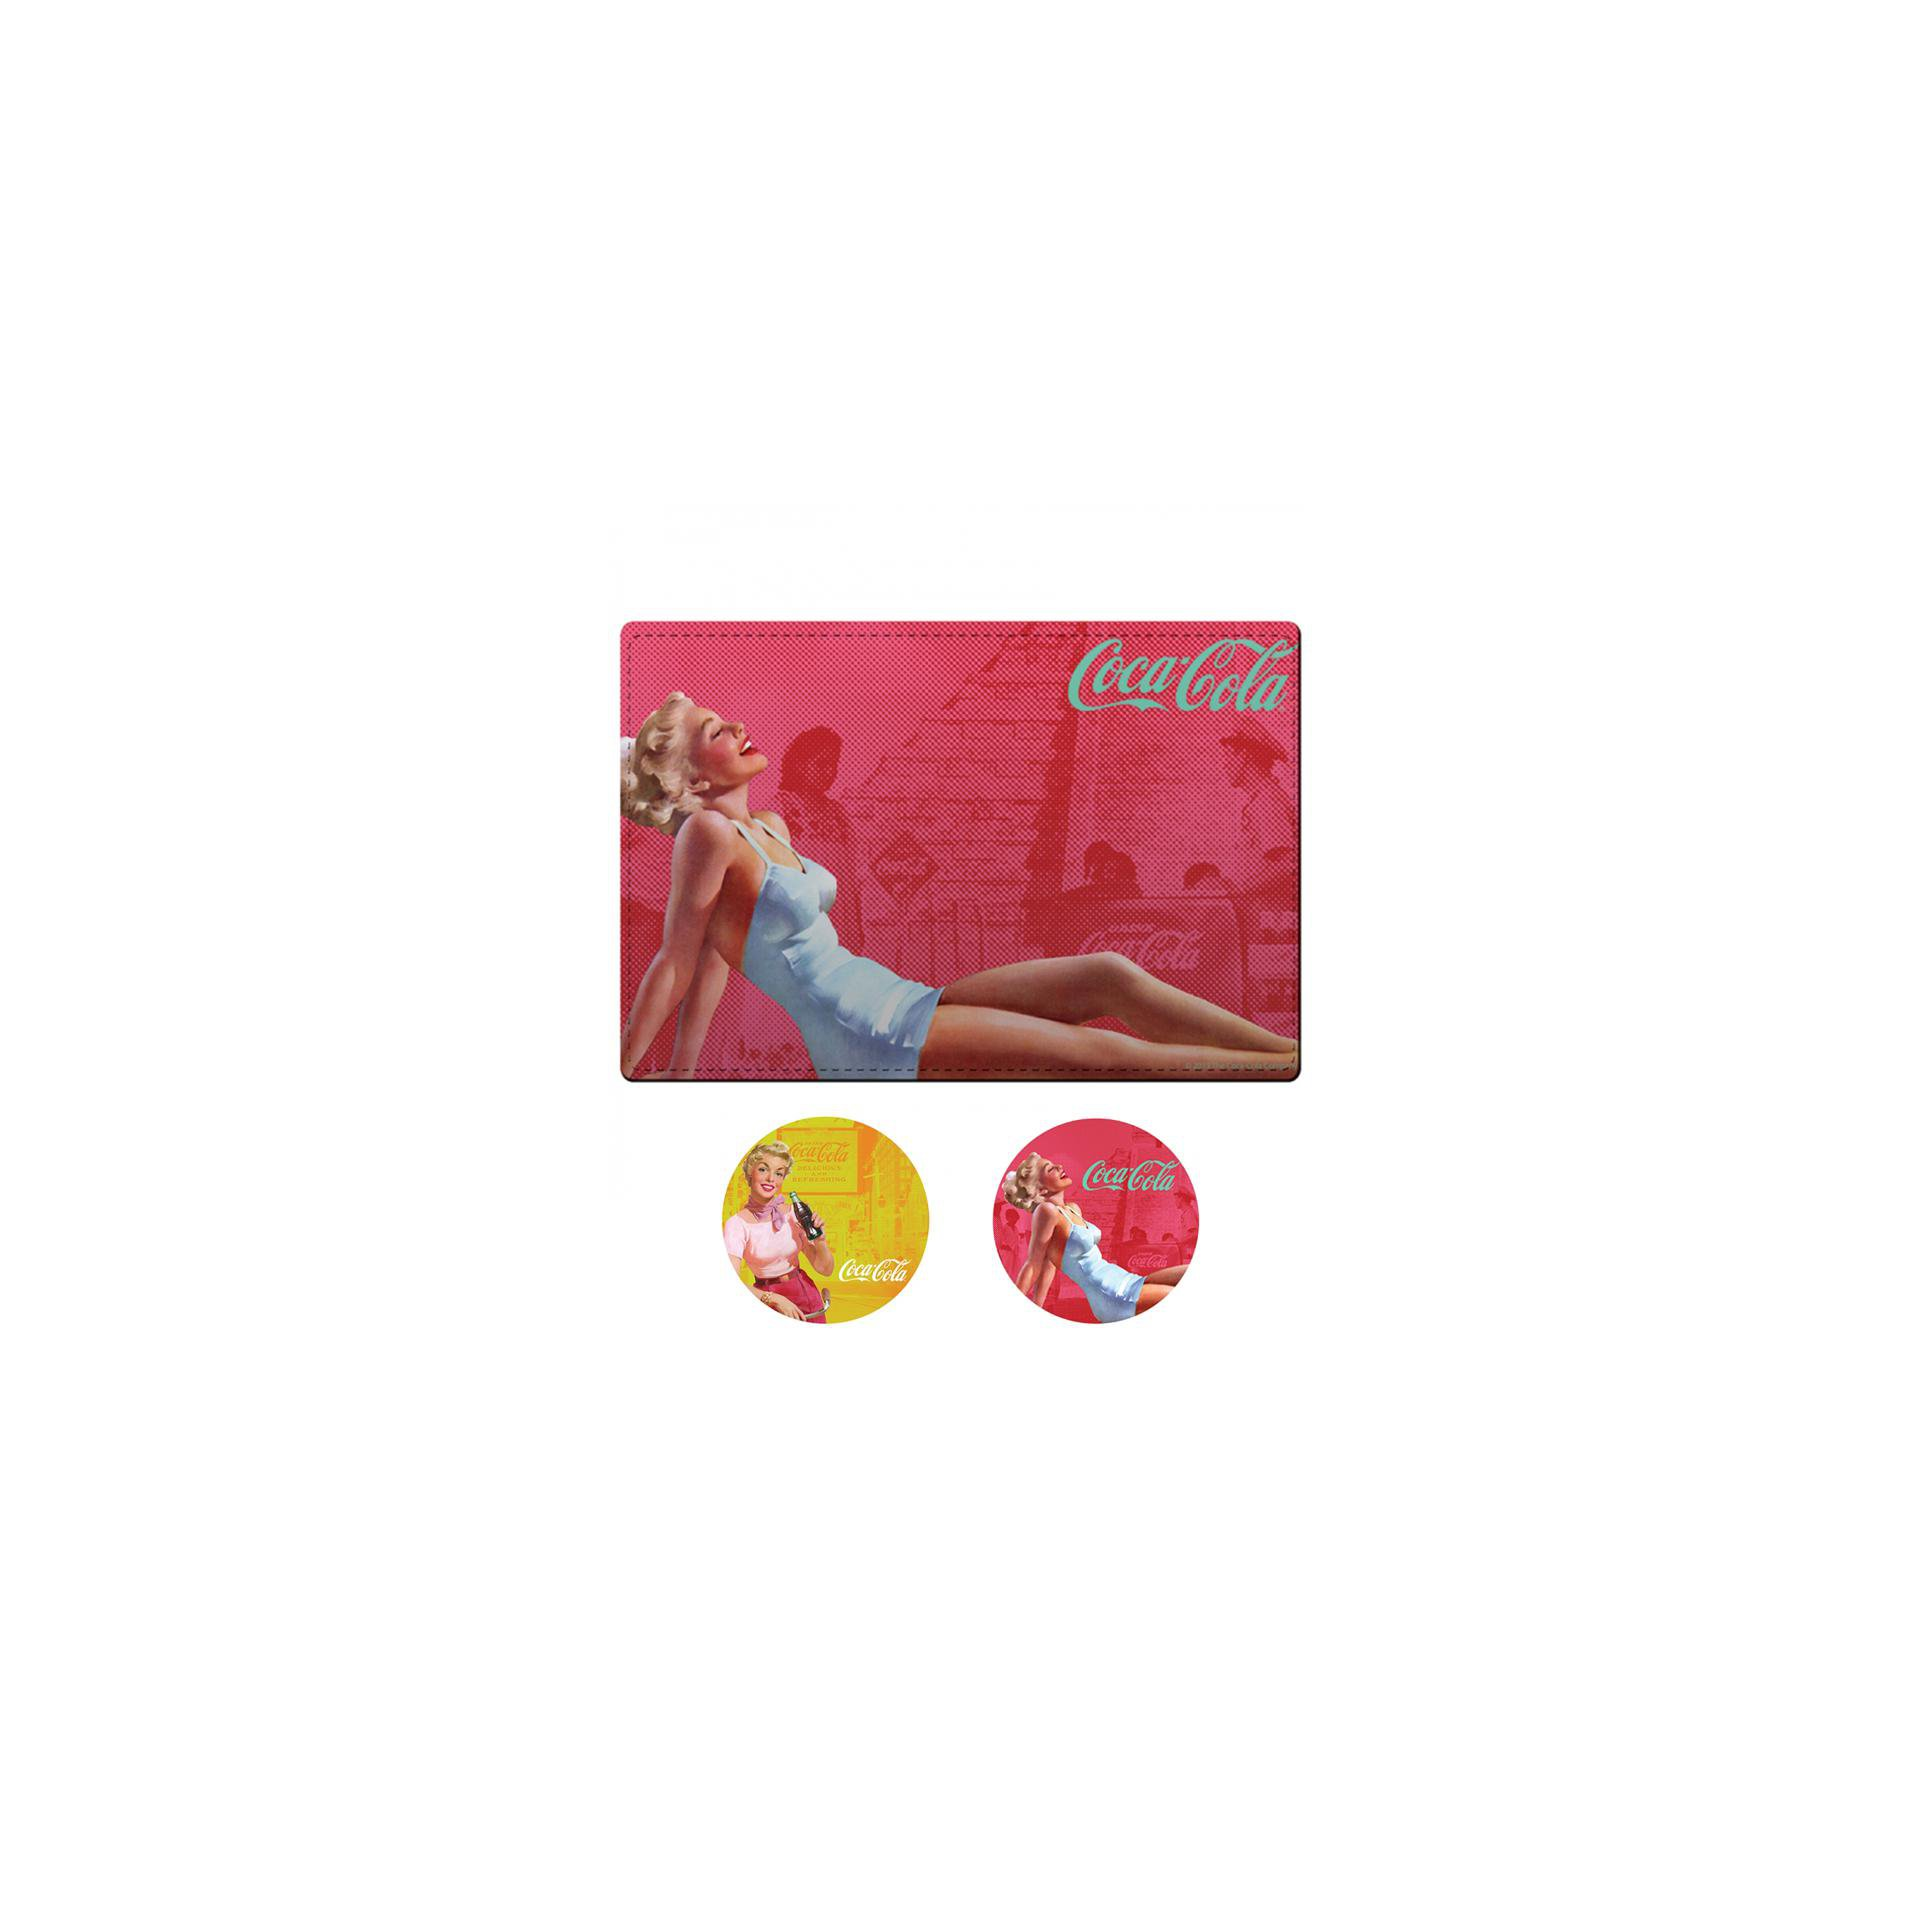 Kit Jogo Americano E Porta Copos Pin Up Blond Lady - Coca-cola